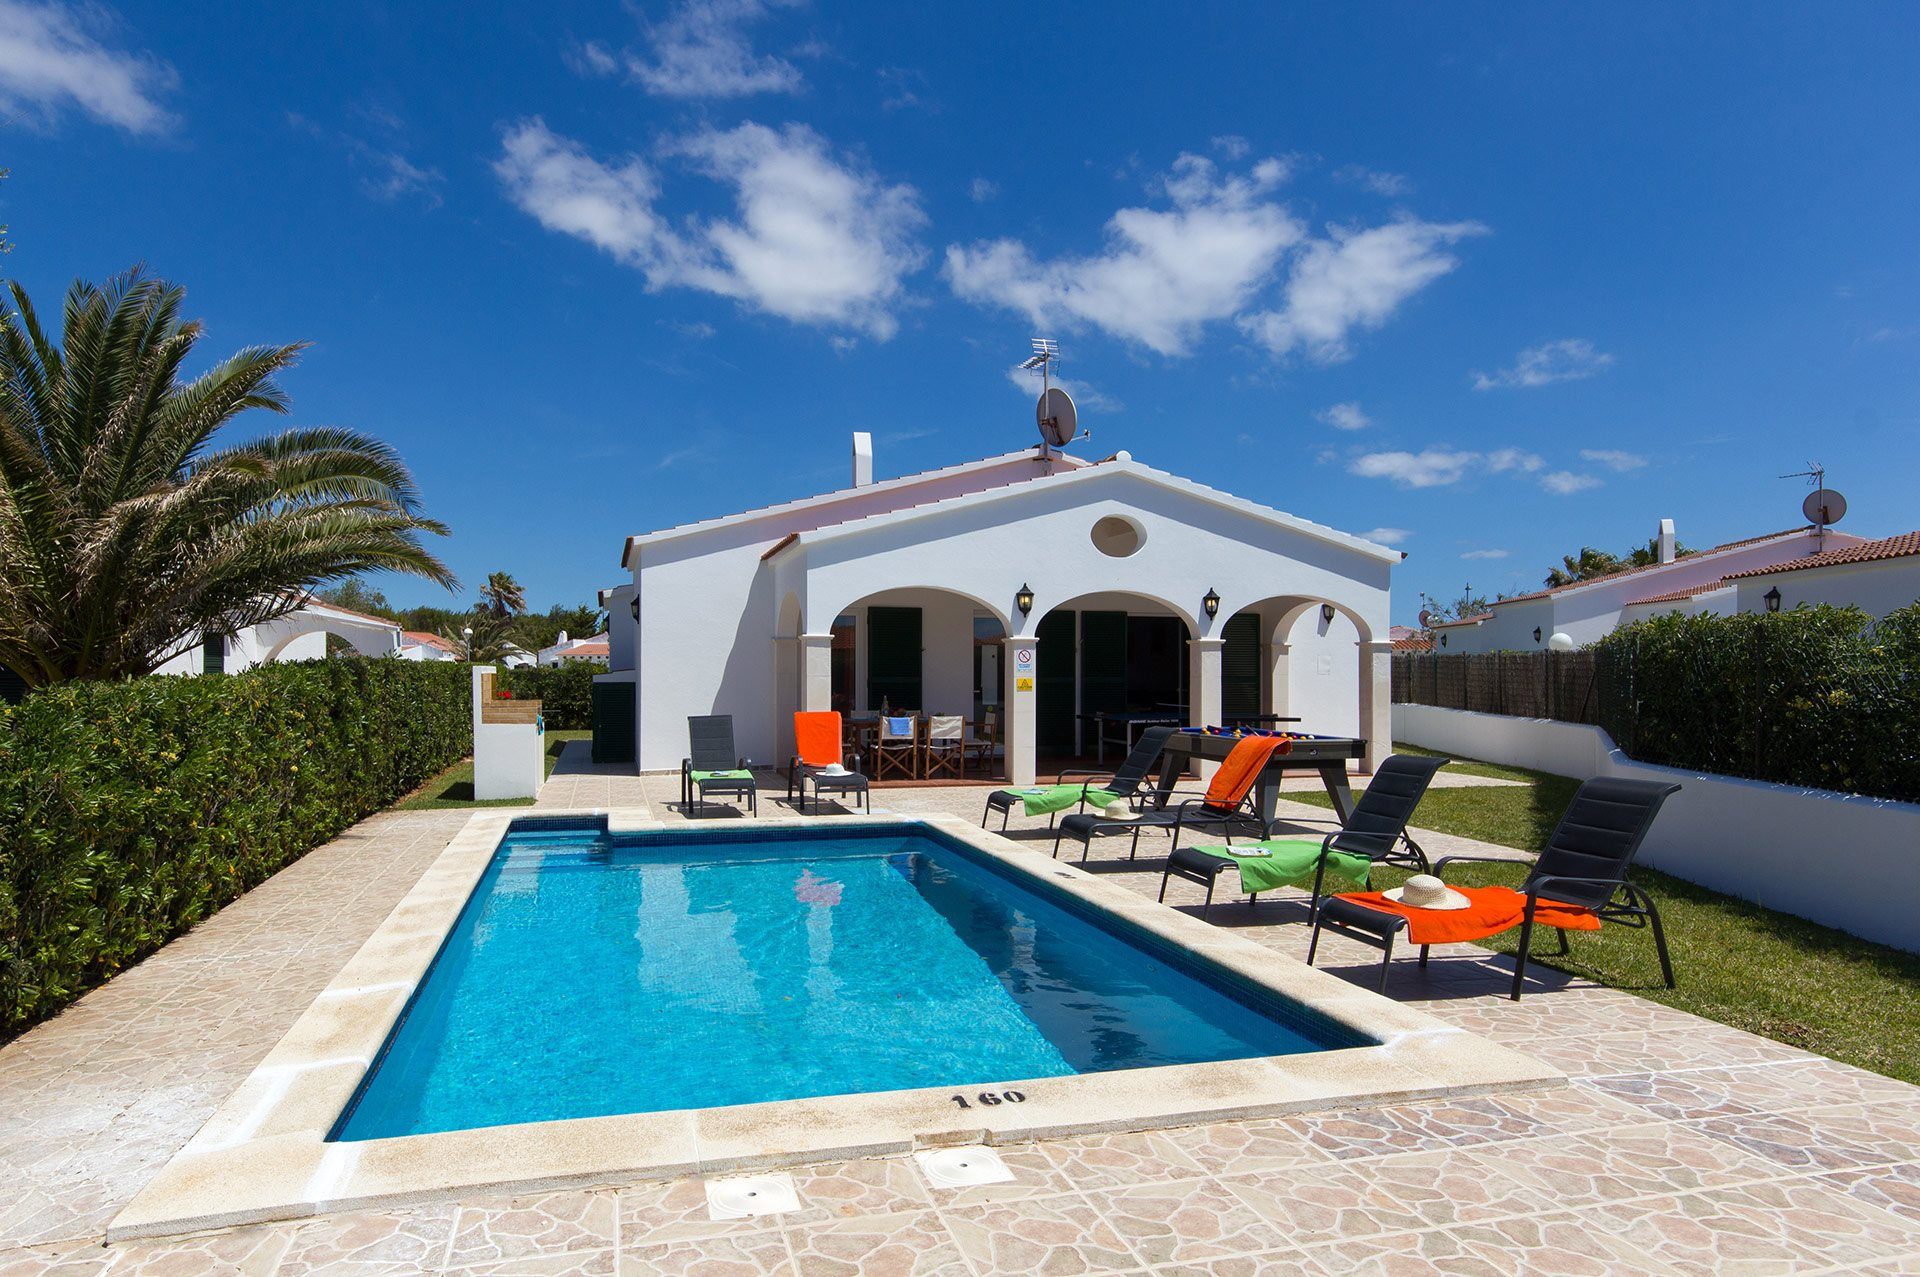 Villa Llentrisca, Calan Bosch, Menorca, Spain